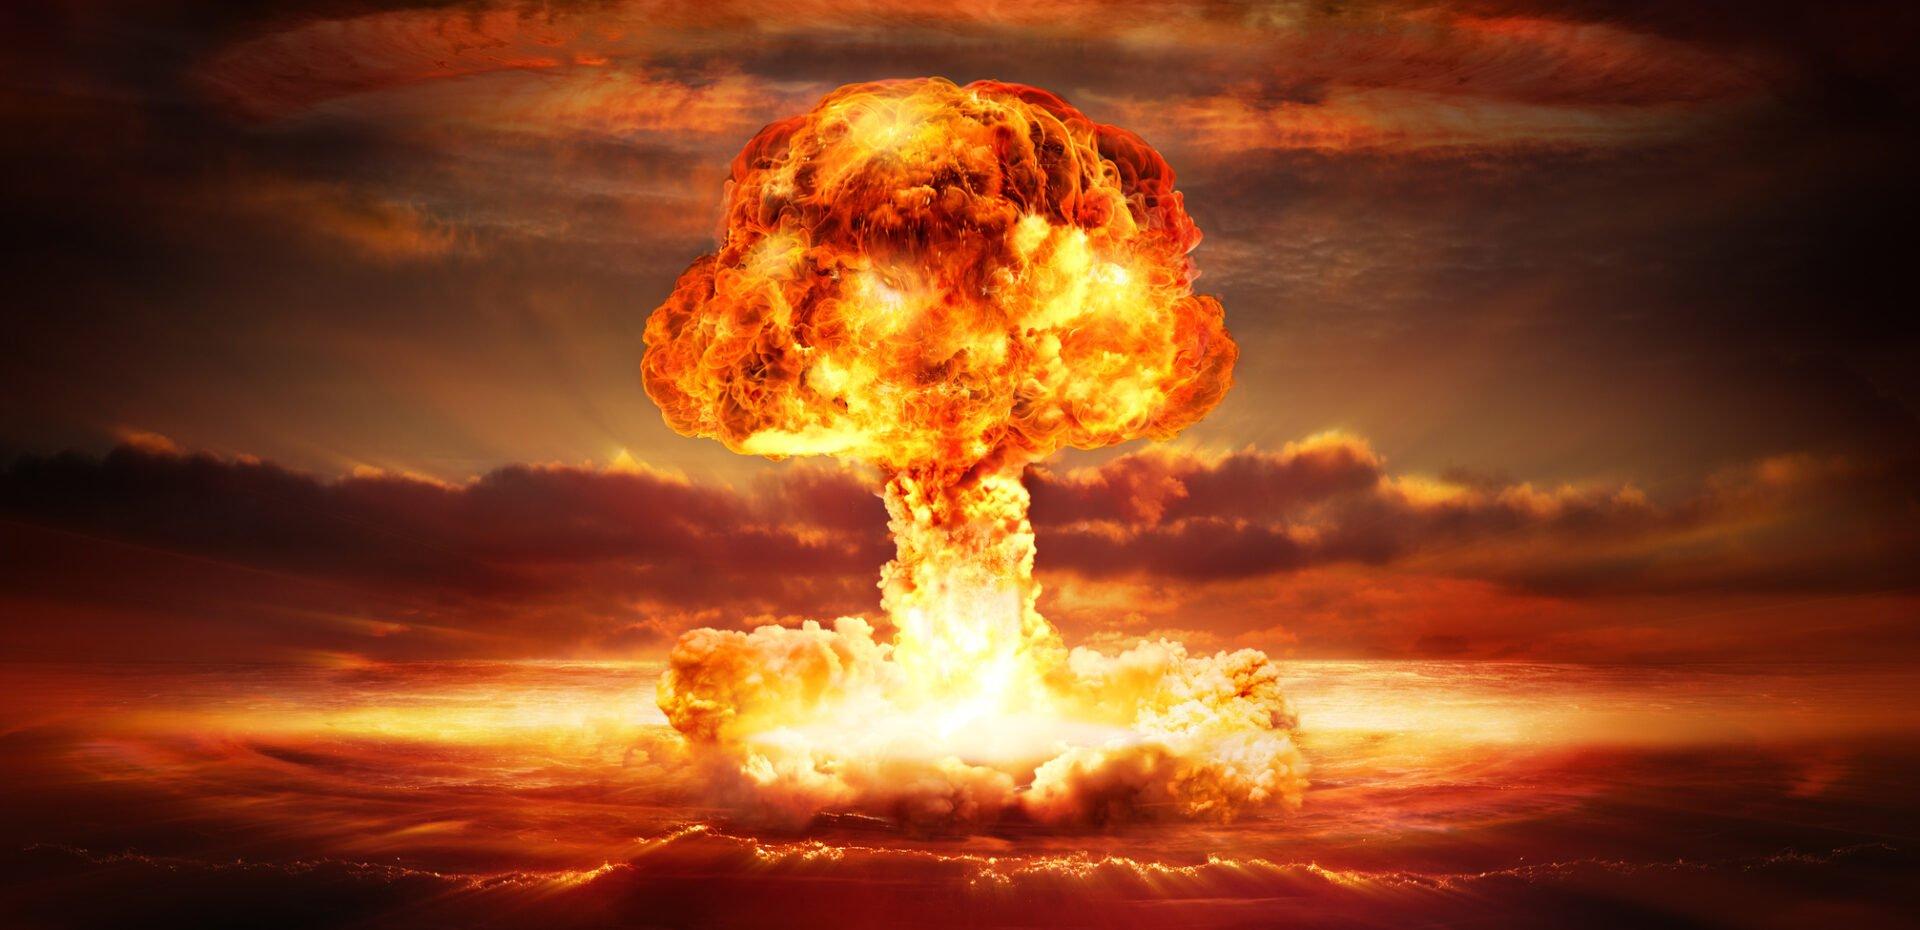 سلاح هسته ای